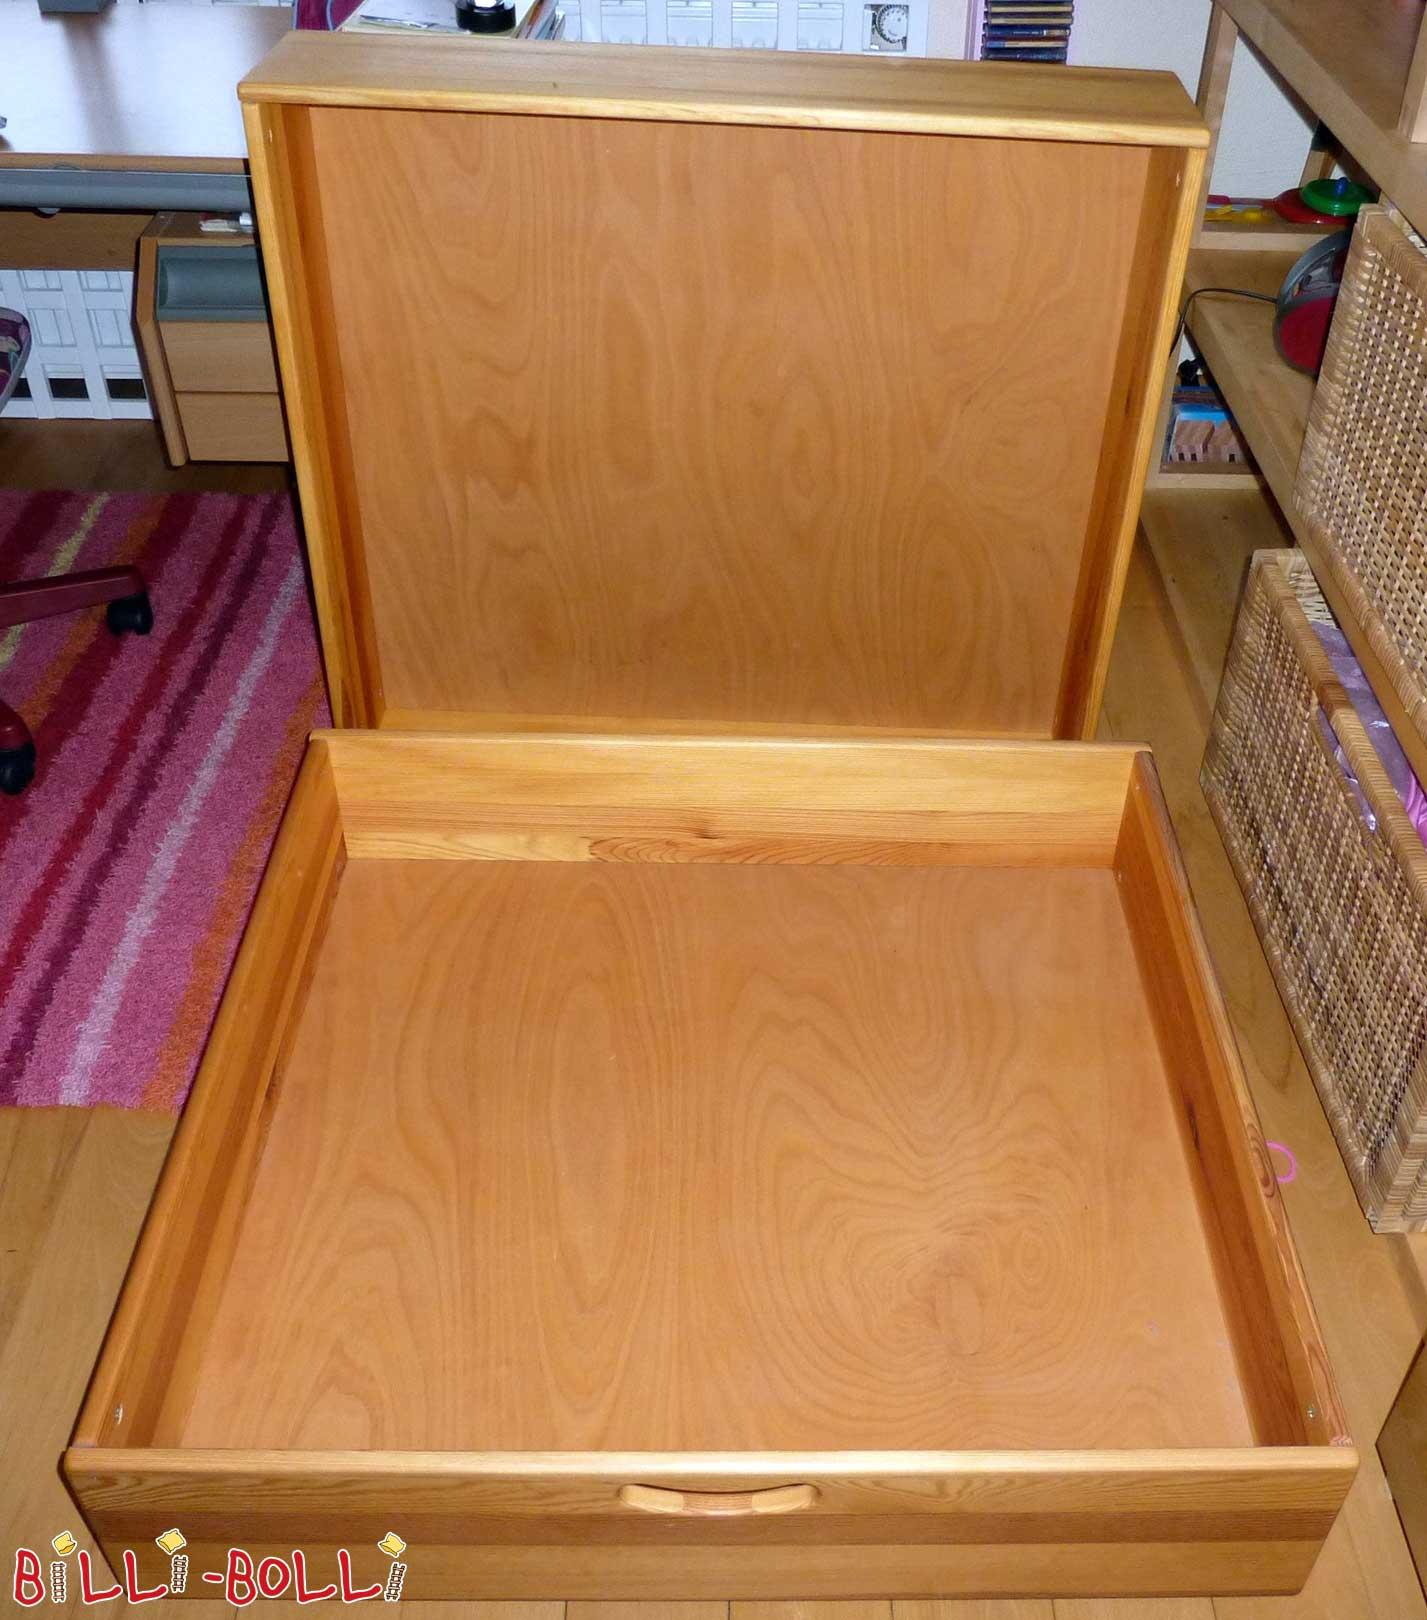 seconde main meubles pour enfants billi bolli. Black Bedroom Furniture Sets. Home Design Ideas